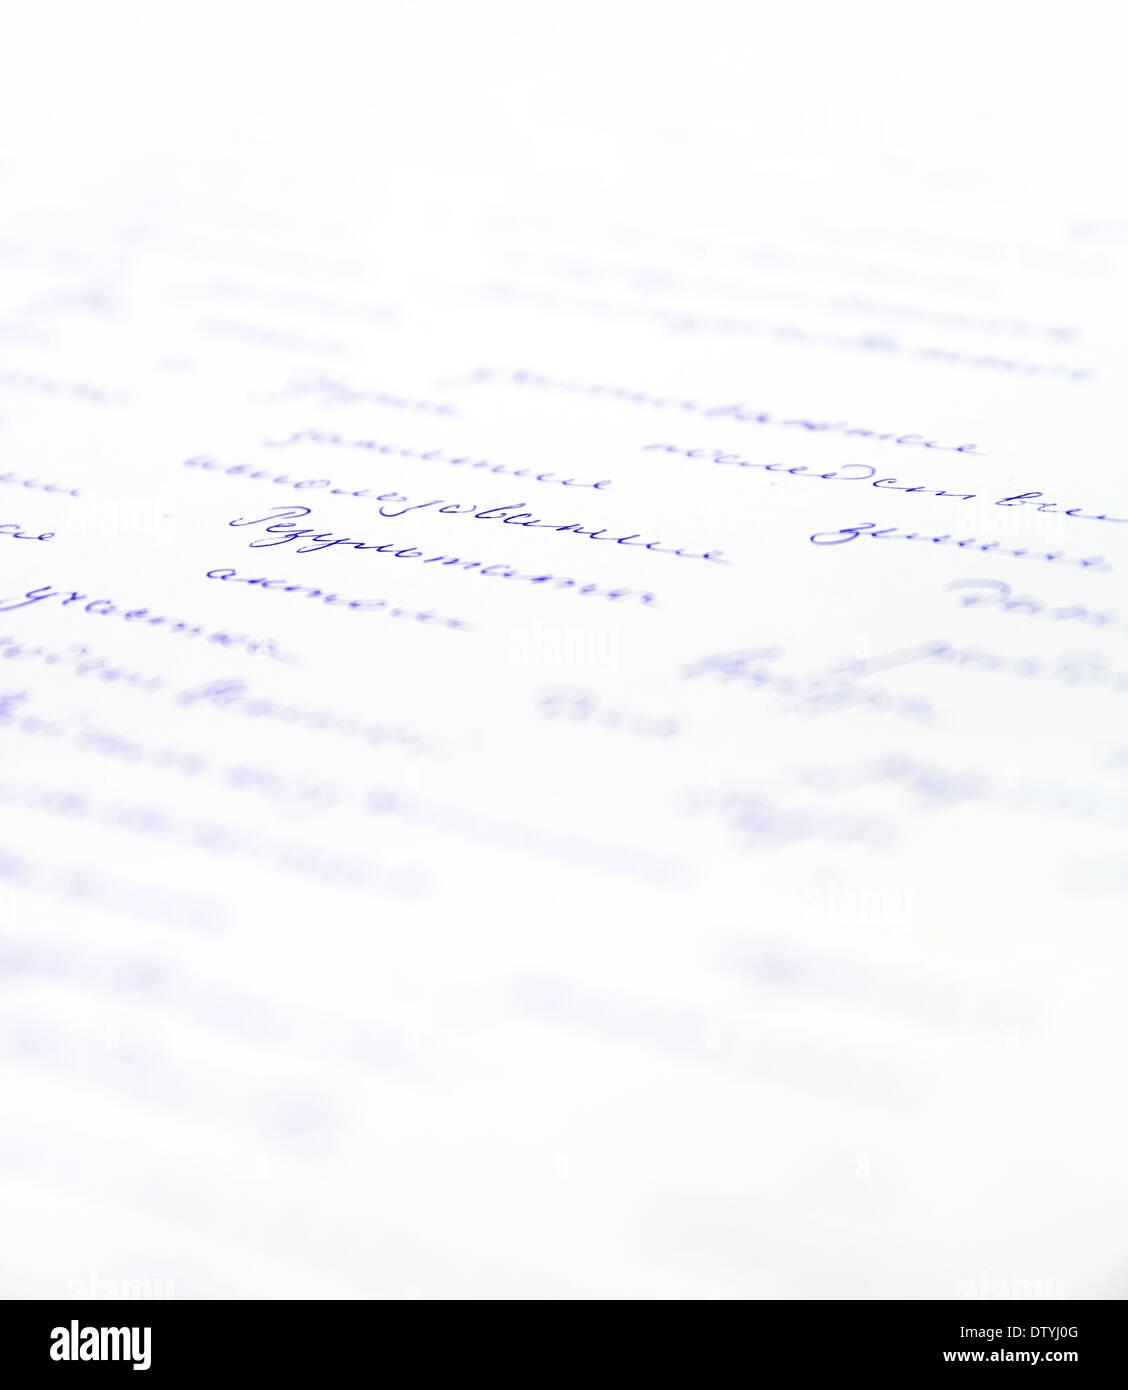 Cursive Handwriting Stock Photos Amp Cursive Handwriting Stock Images